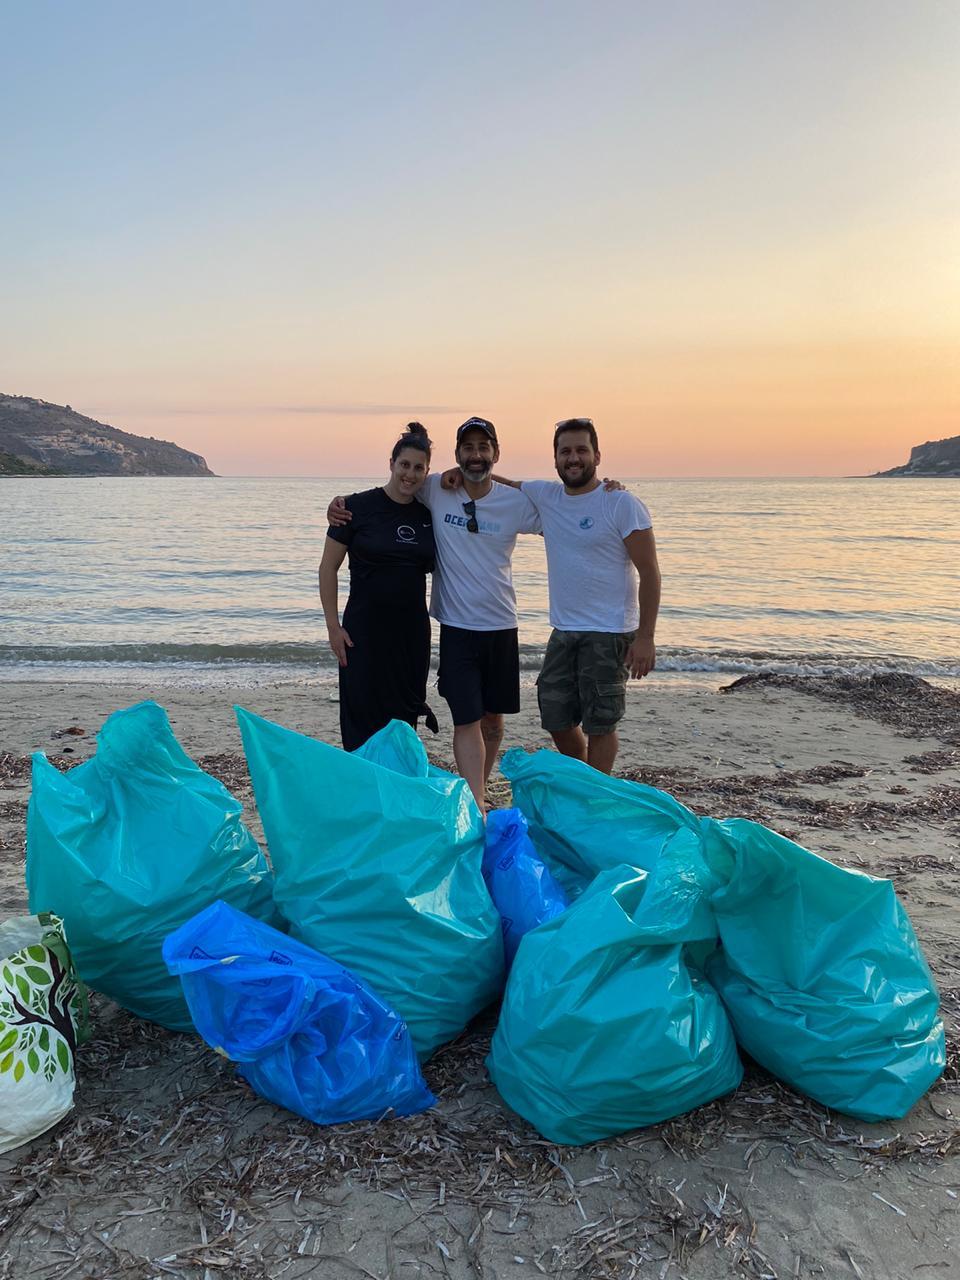 Beach clean-up, Oceanman Greece 2020, Oitylo 27 June 2020